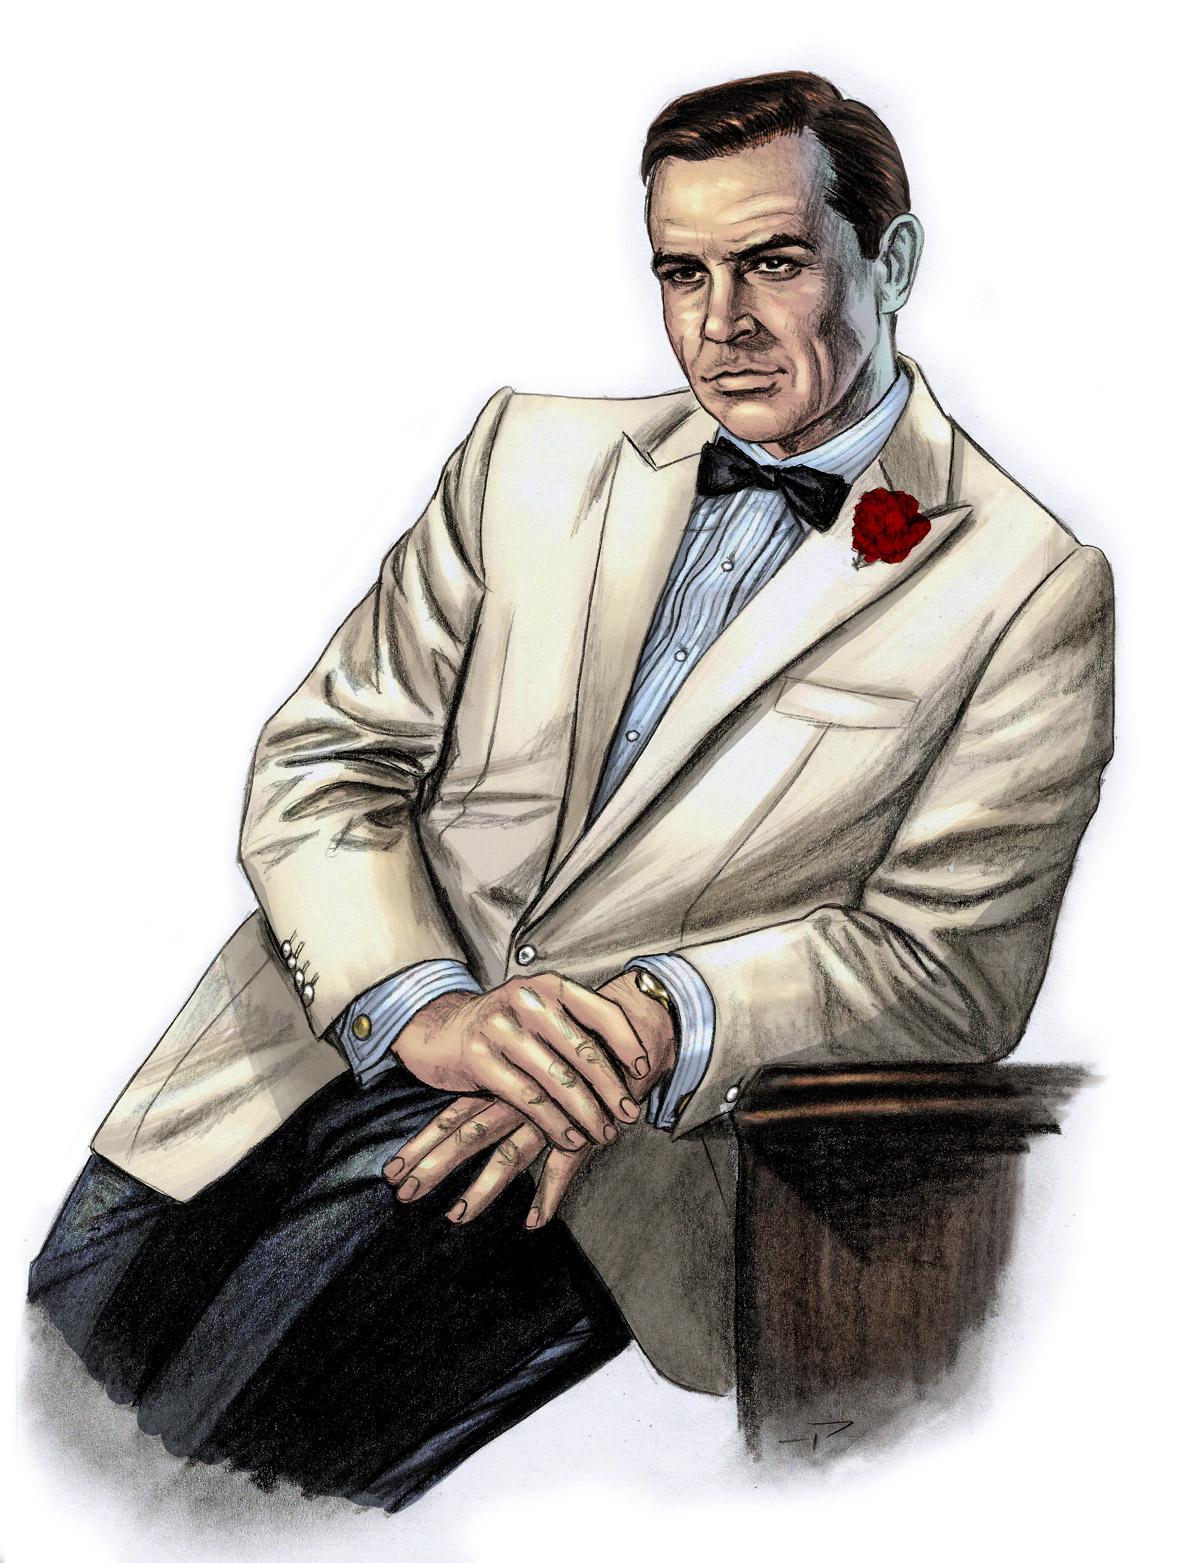 1200x1563 James Bond Black Tie Illustrations By Pat Carbajal The Suits